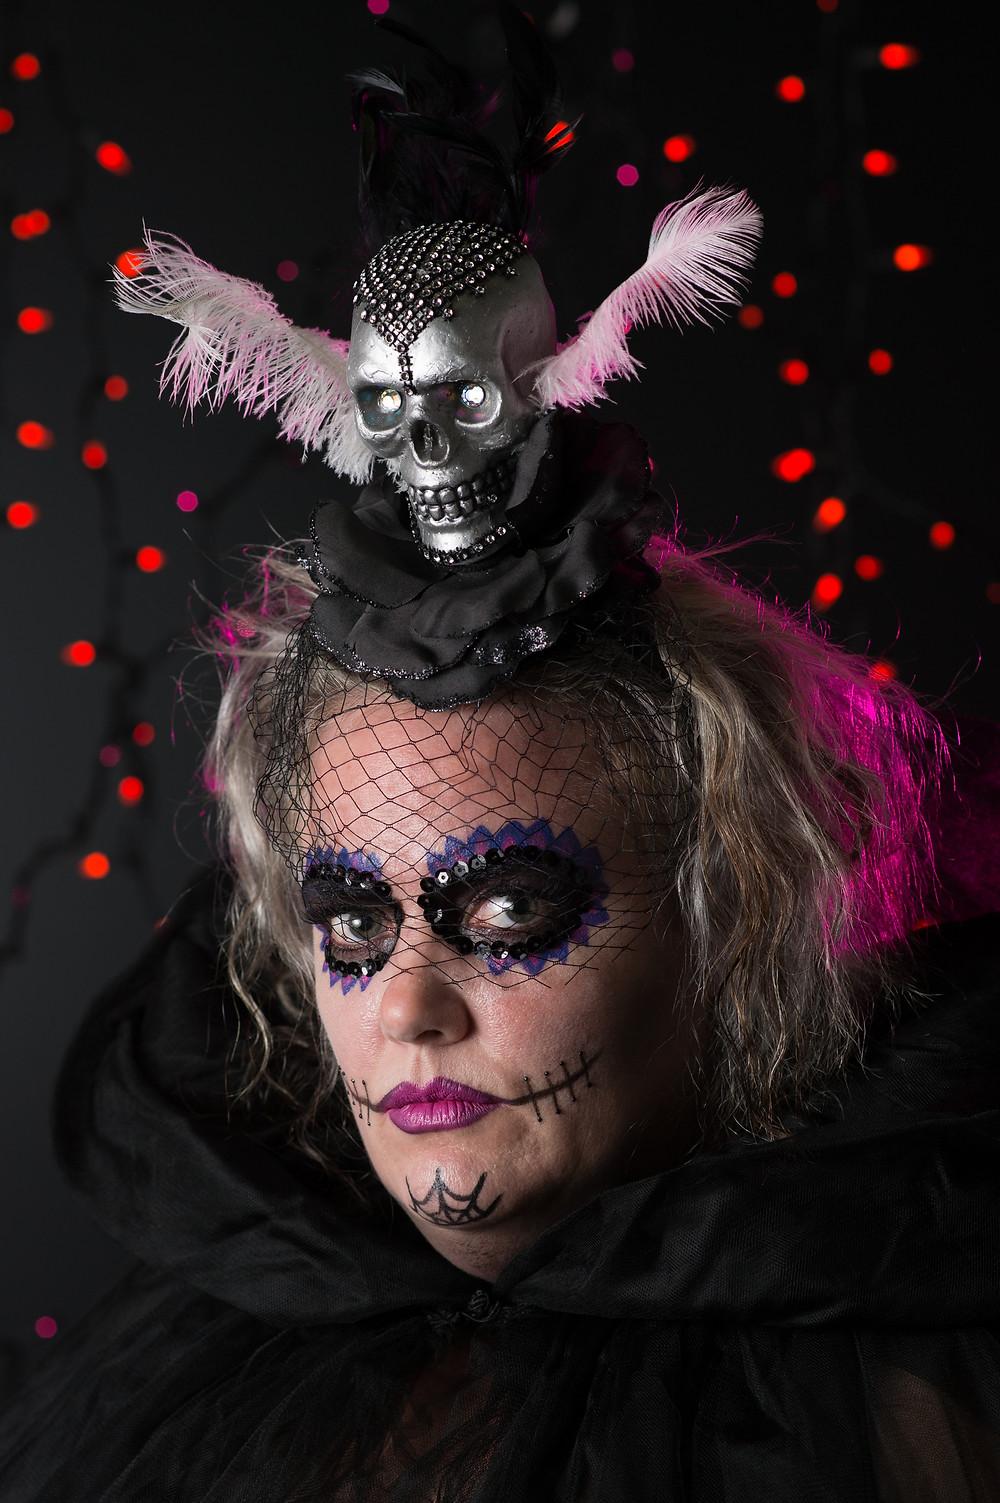 Heidi with elaborate makeup and skull headpiece